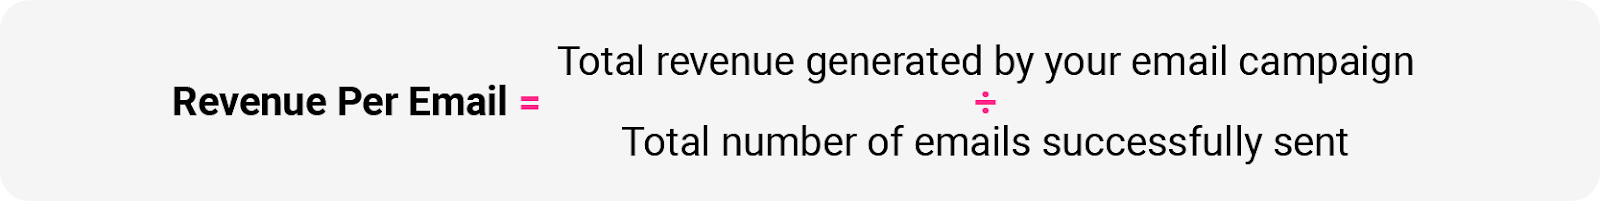 email_marketing_revenue_per_email